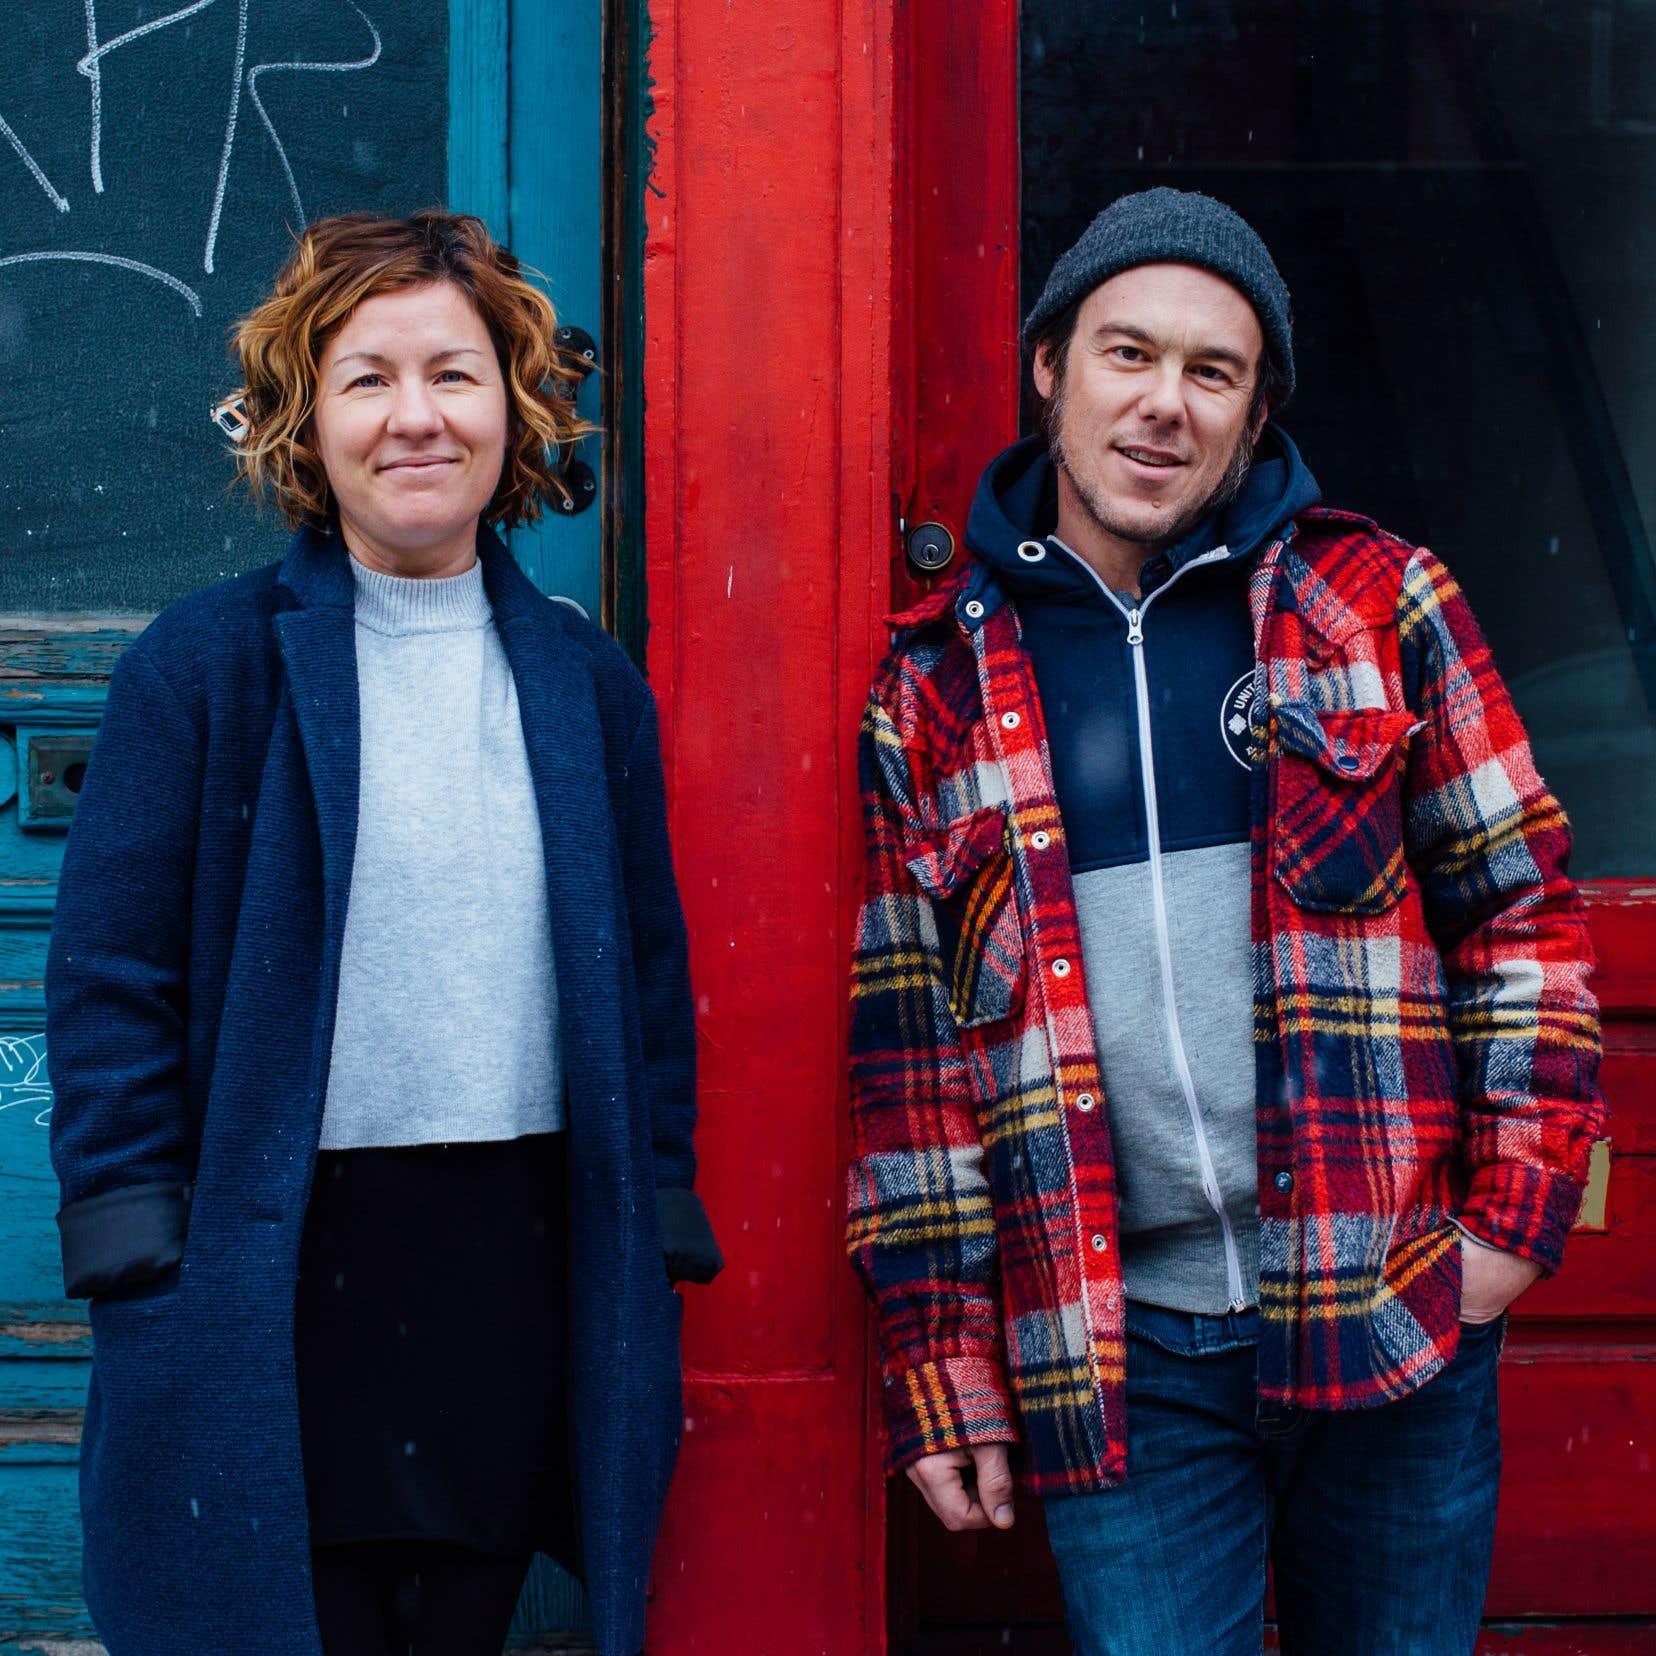 Le duo folk Saratoga: Chantal Archambault et Michel-Olivier Gasse